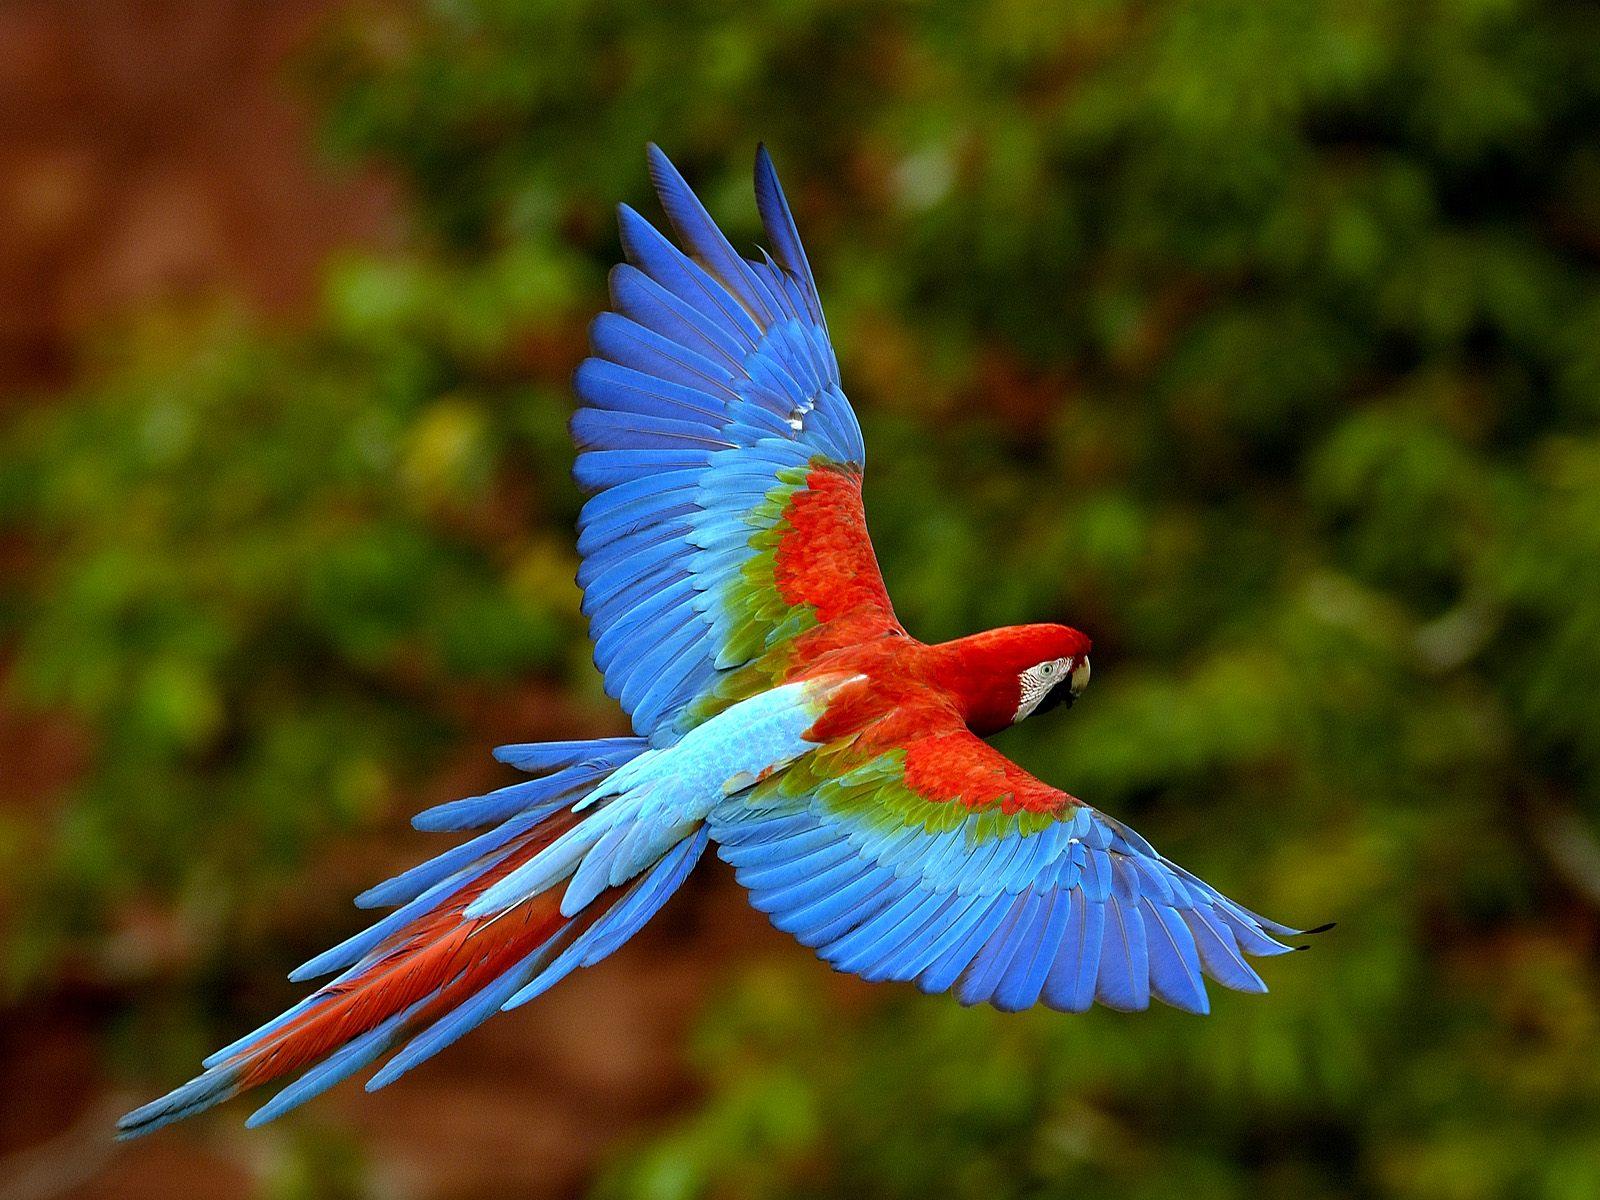 http://1.bp.blogspot.com/-O0bCJ7rwoEE/TdfLPT62UwI/AAAAAAAAAKc/RcoYpr8cmvw/s1600/macaw-flying.jpg